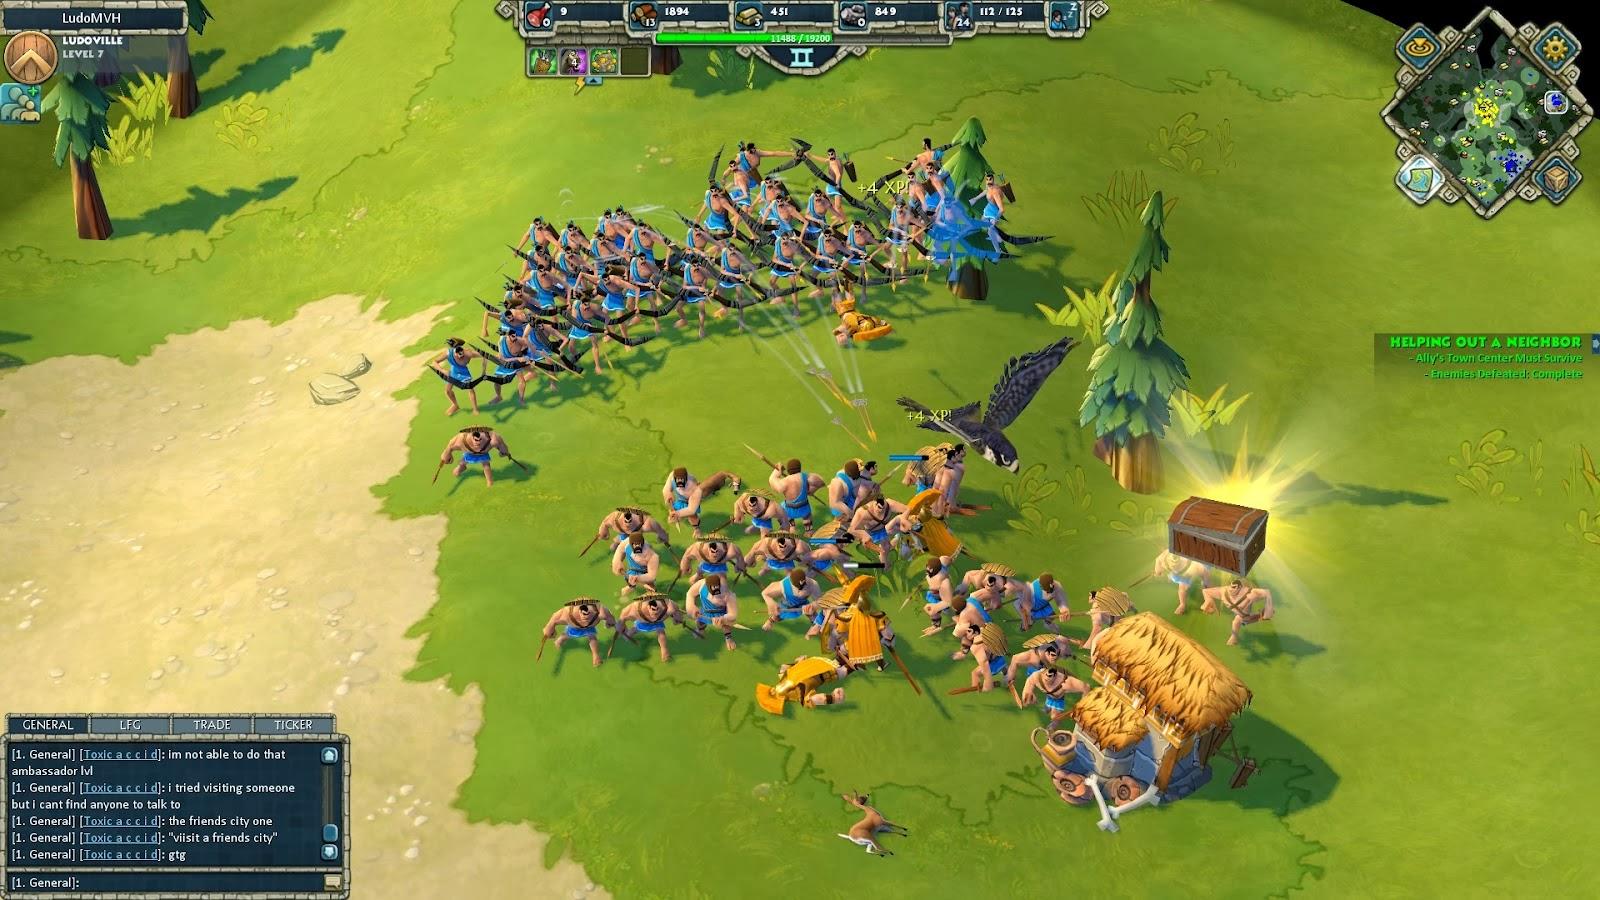 Coole Spiele Online